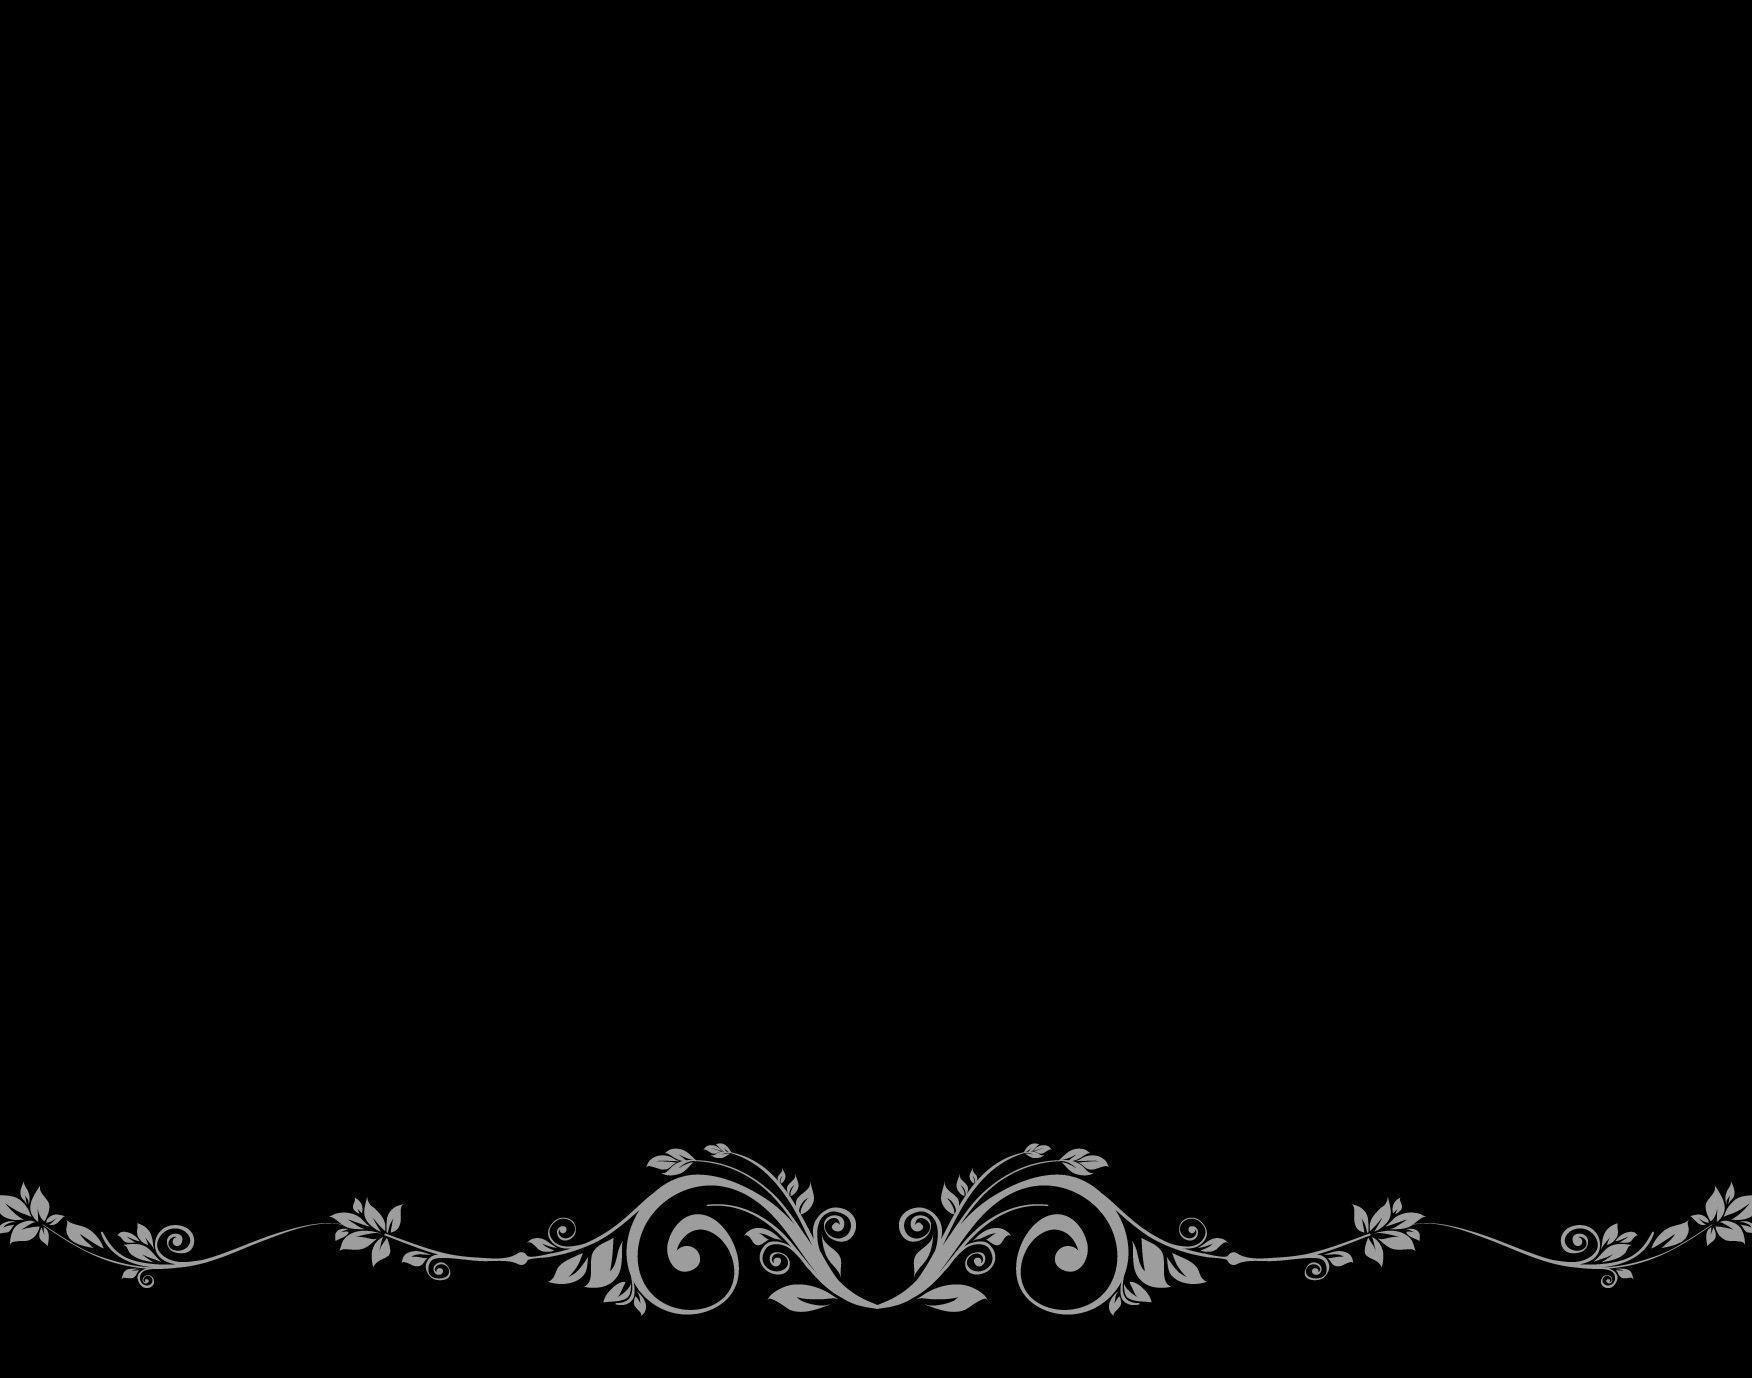 Black Elegant Wallpapers Wallpaper Cave